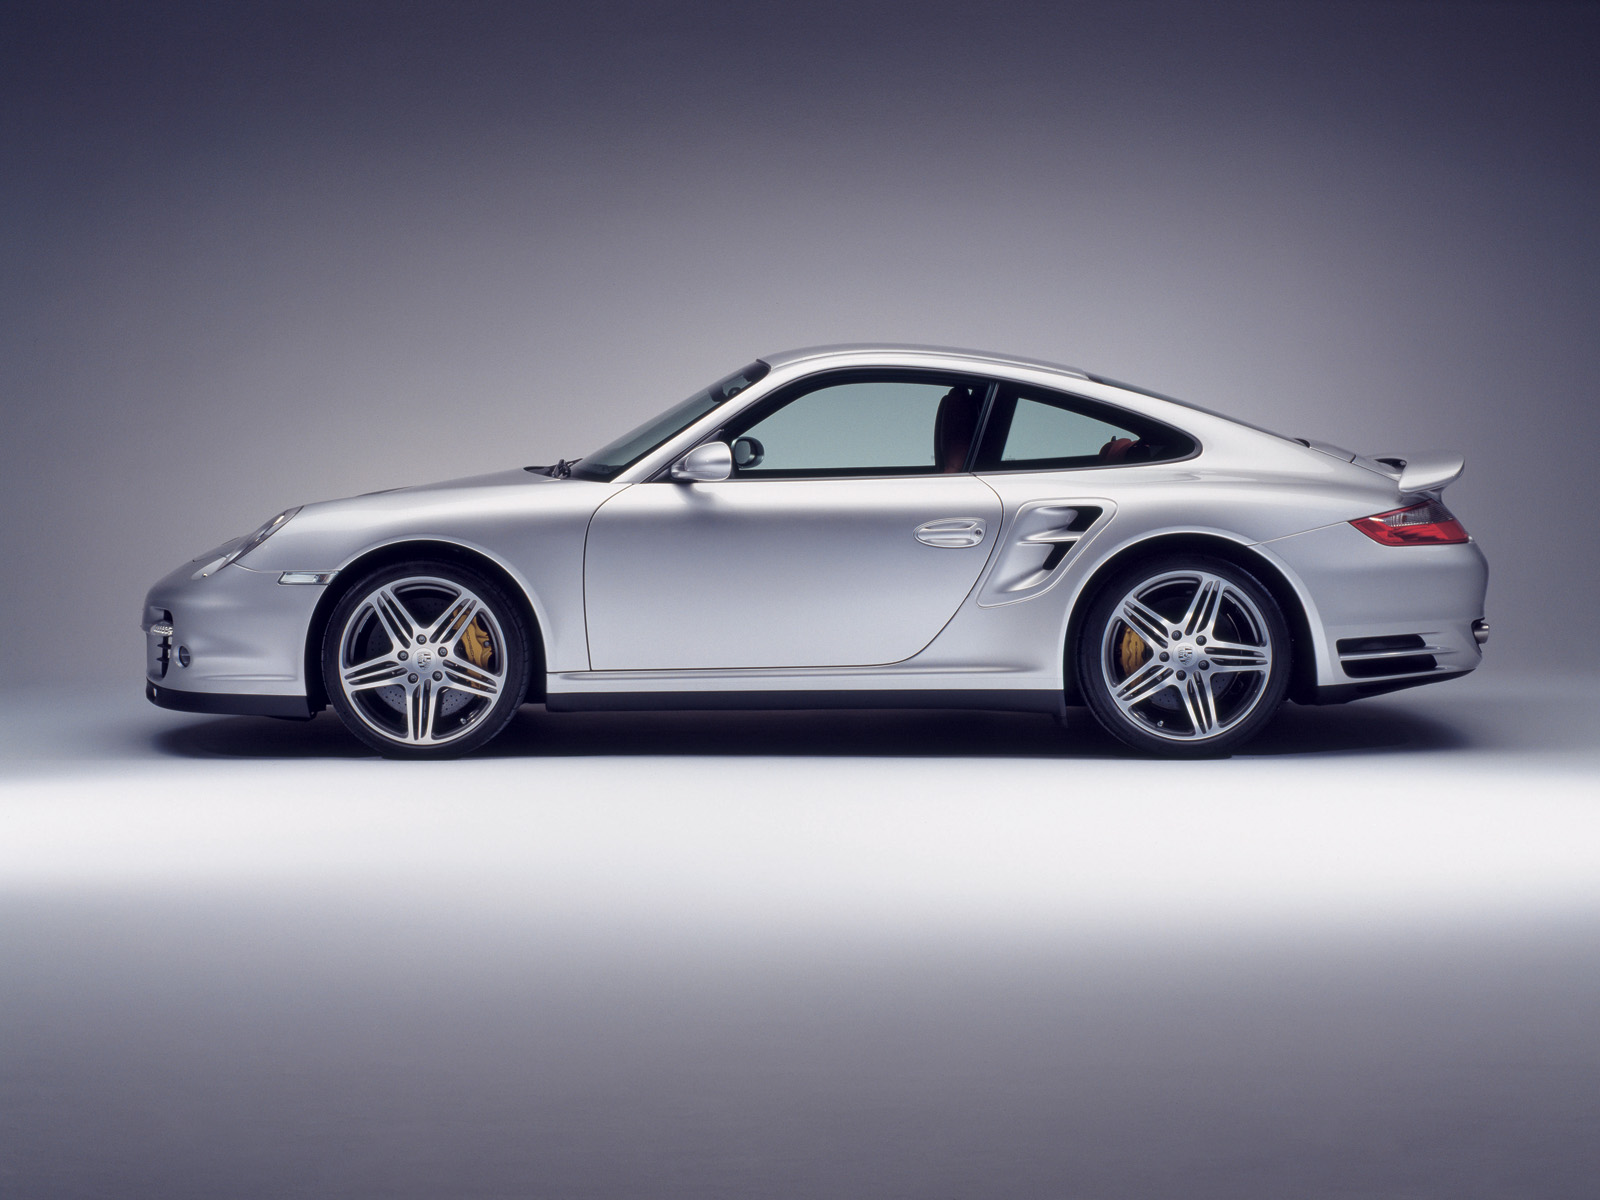 Porsche 997 911 Turbo Cars Wallpapers 1600x1200